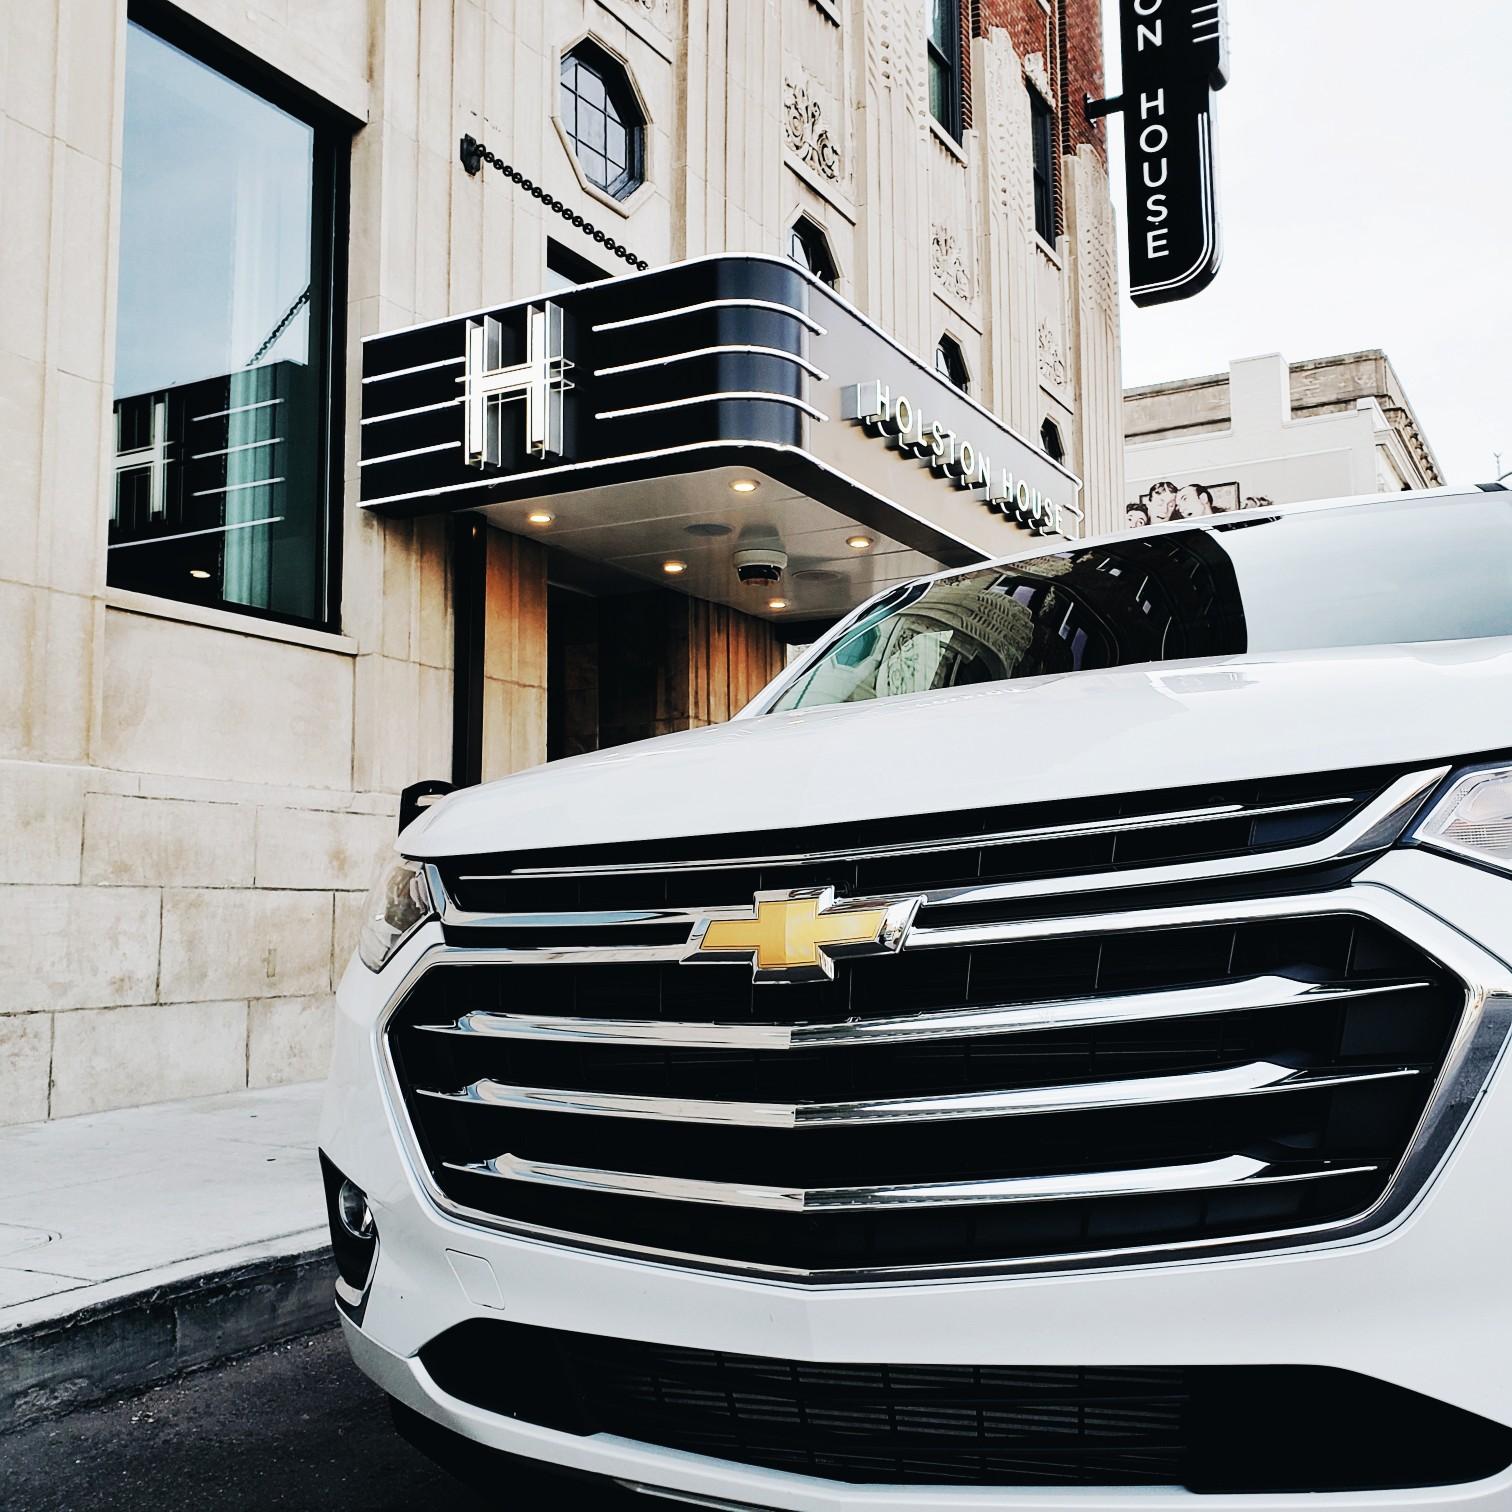 2018 Chevrolet Traverse Front Design